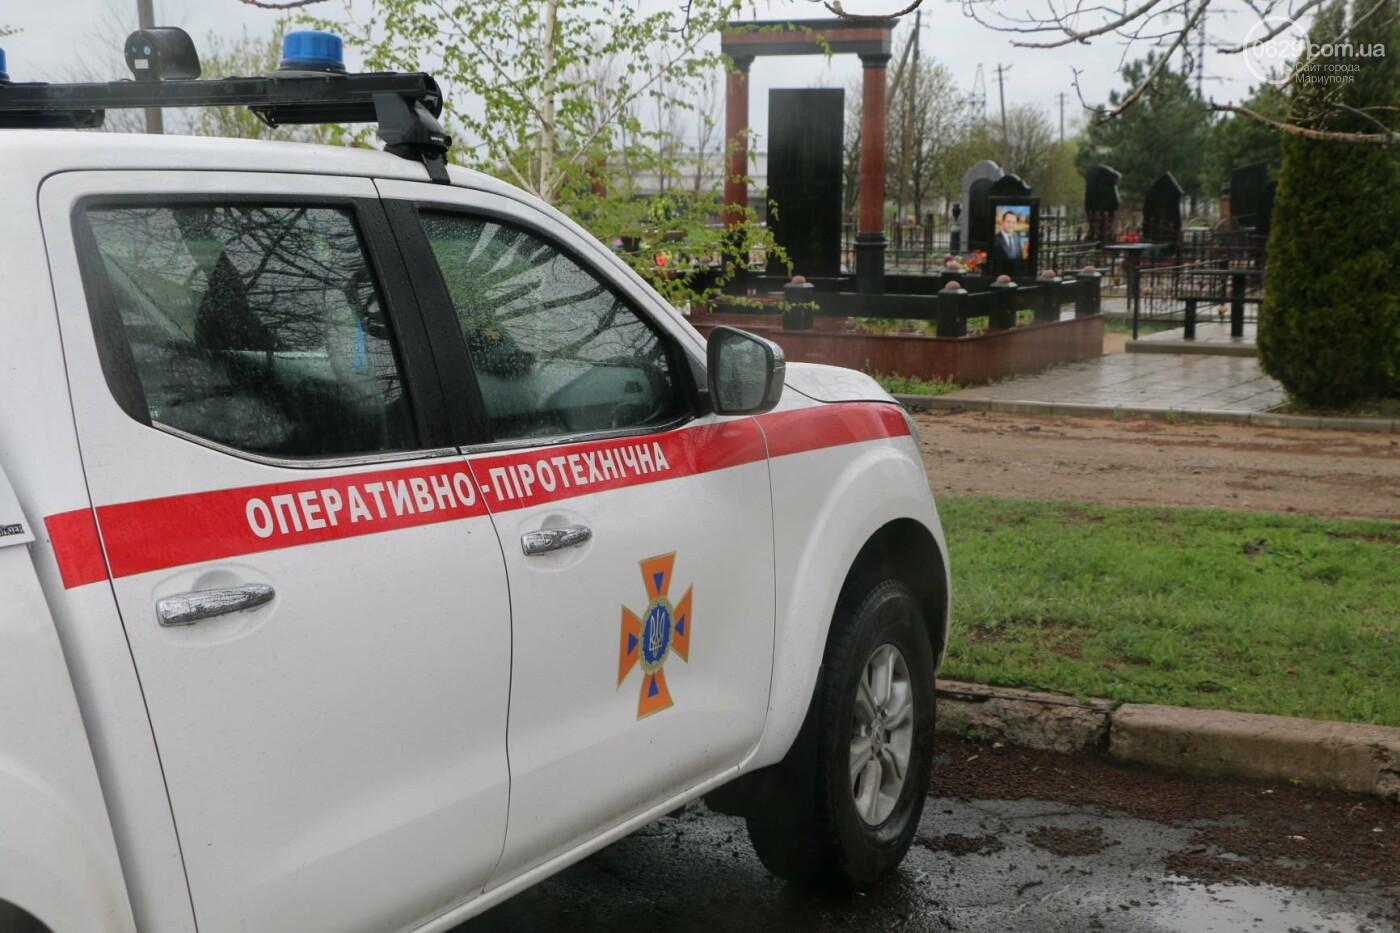 Пиротехники начали проверять безопасность кладбищ Мариуполя,- ФОТО, ВИДЕО, фото-6